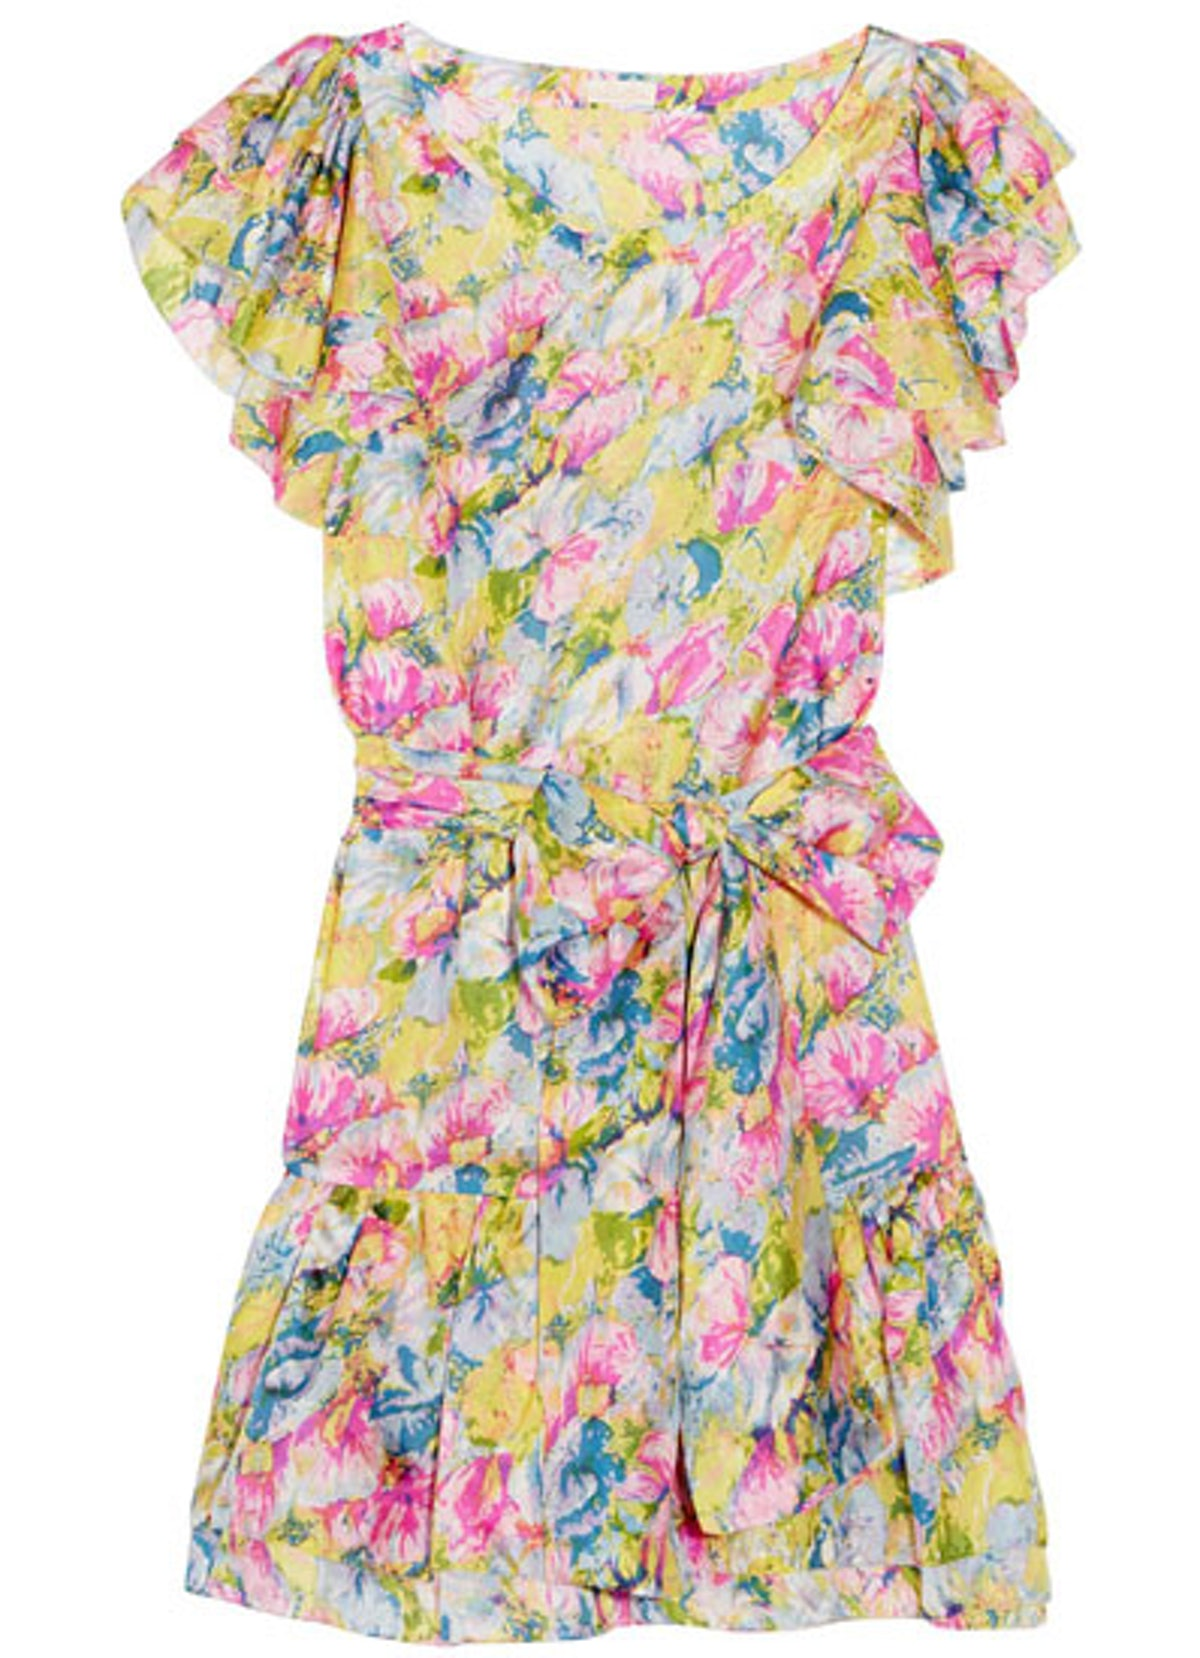 fass-floral-dresses-09-v.jpg